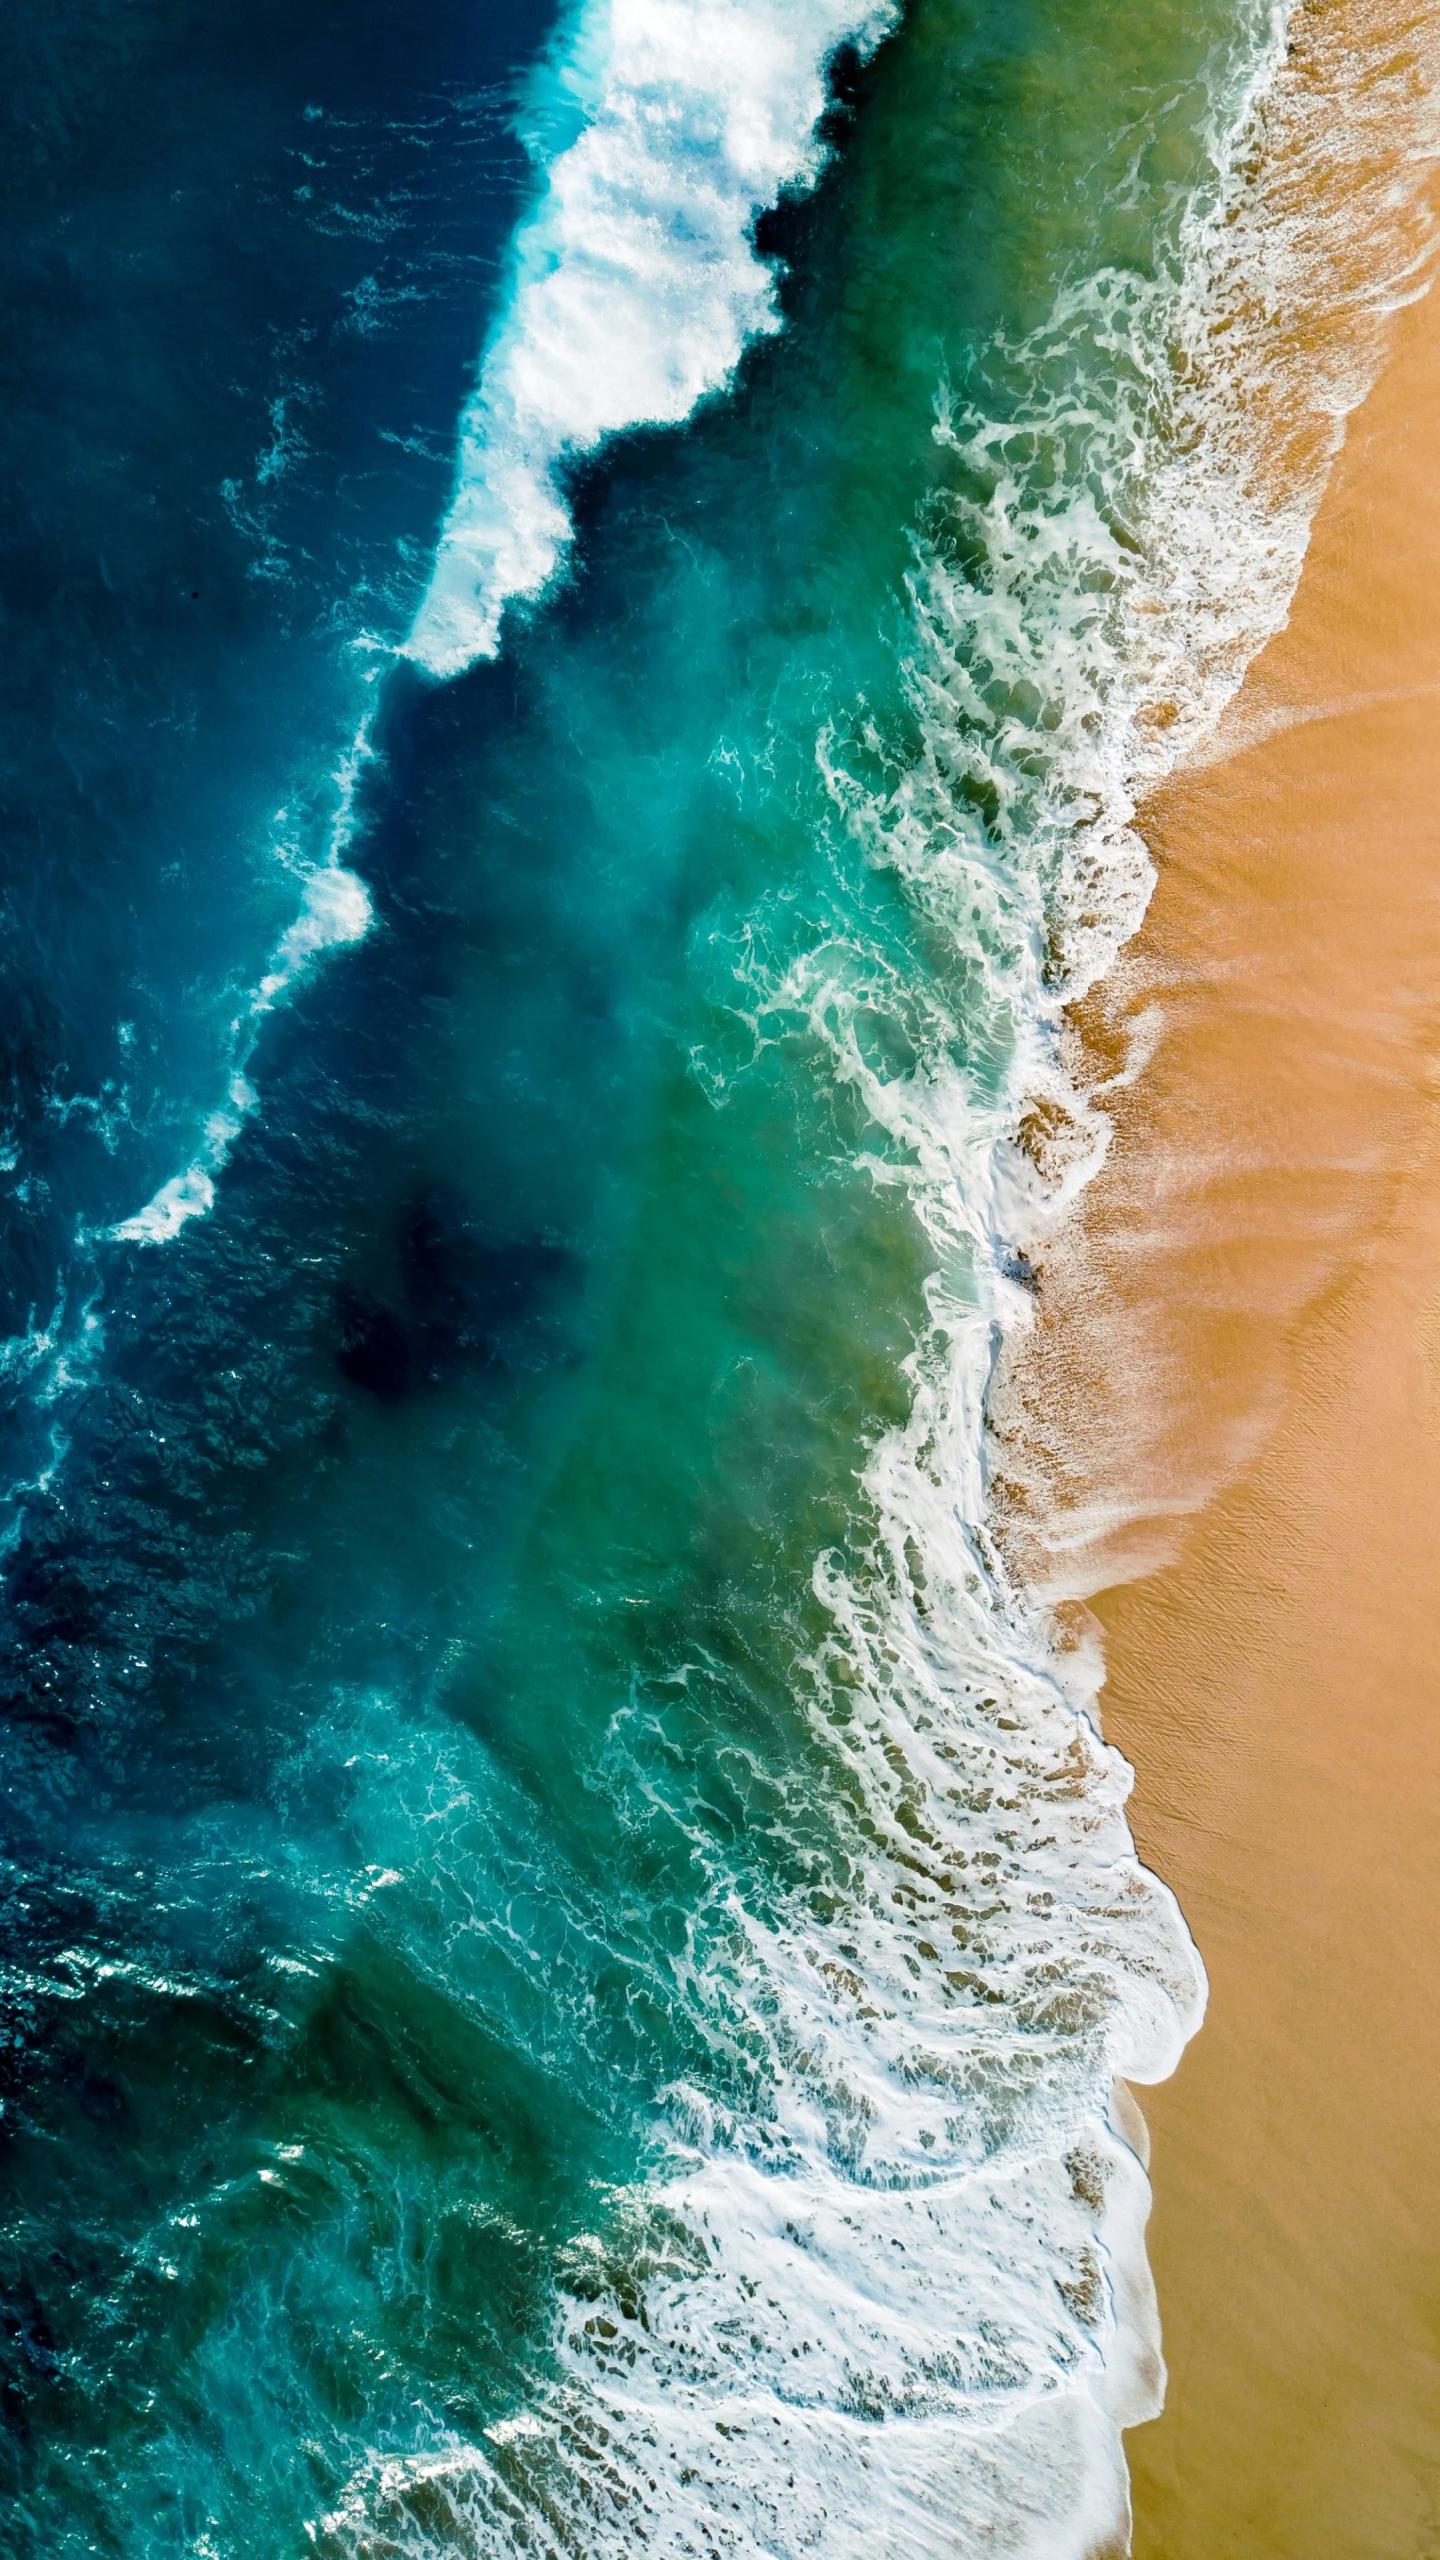 Free Download Sea 4k Wallpaper 42 In 2020 Iphone Wallpaper Earth Ocean 2156x3840 For Your Desktop Mobile Tablet Explore 45 Iphone 4k 2020 Wallpapers 4k 2020 Iphone Wallpapers Iphone 4k 2020 Wallpapers Iphone 11 Pro 4k 2020 Wallpapers